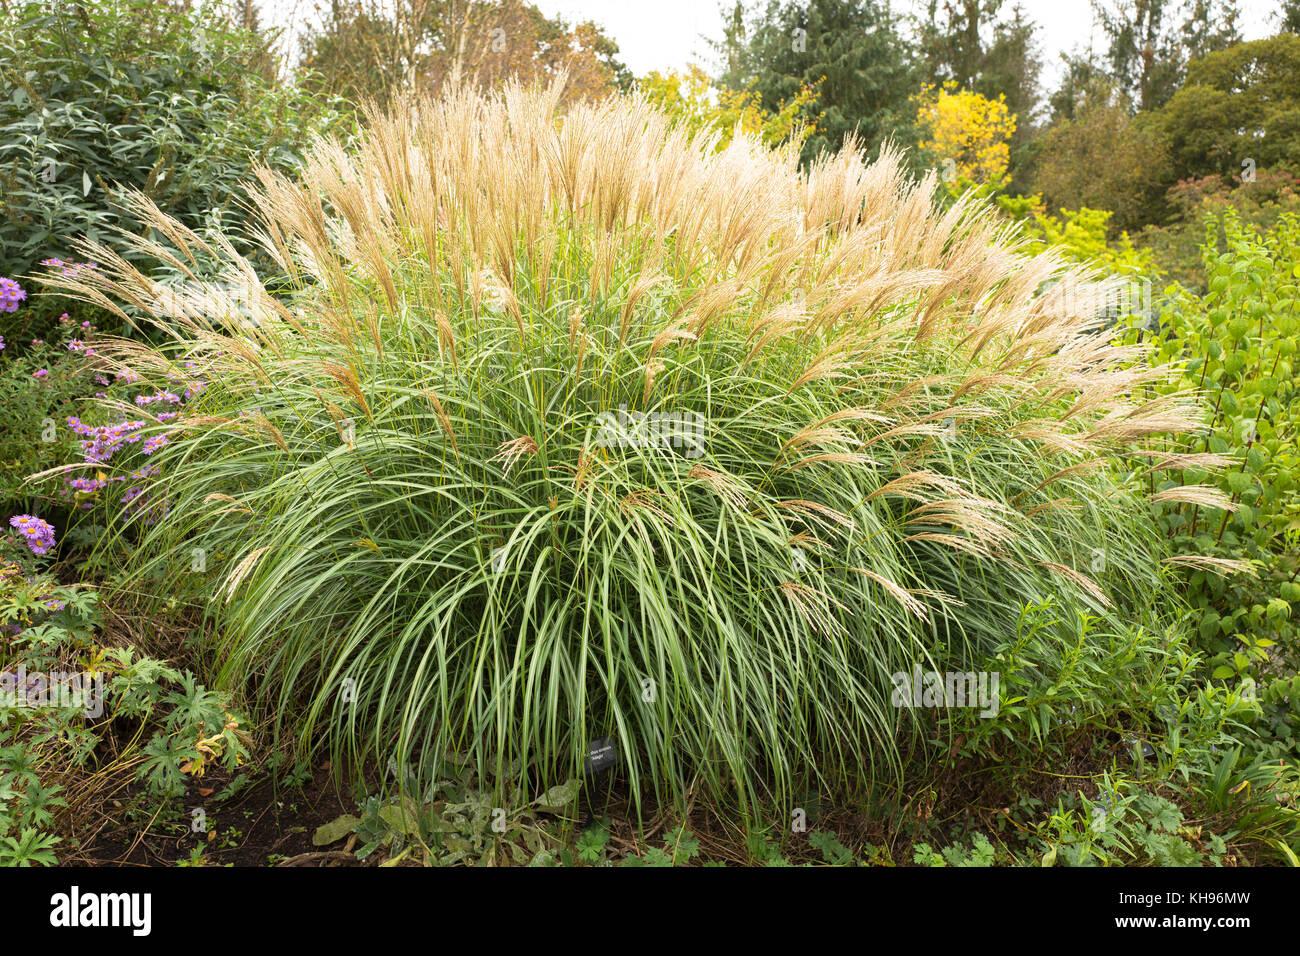 Hardy perennial ornamental stock photos hardy perennial for Flowering ornamental grasses